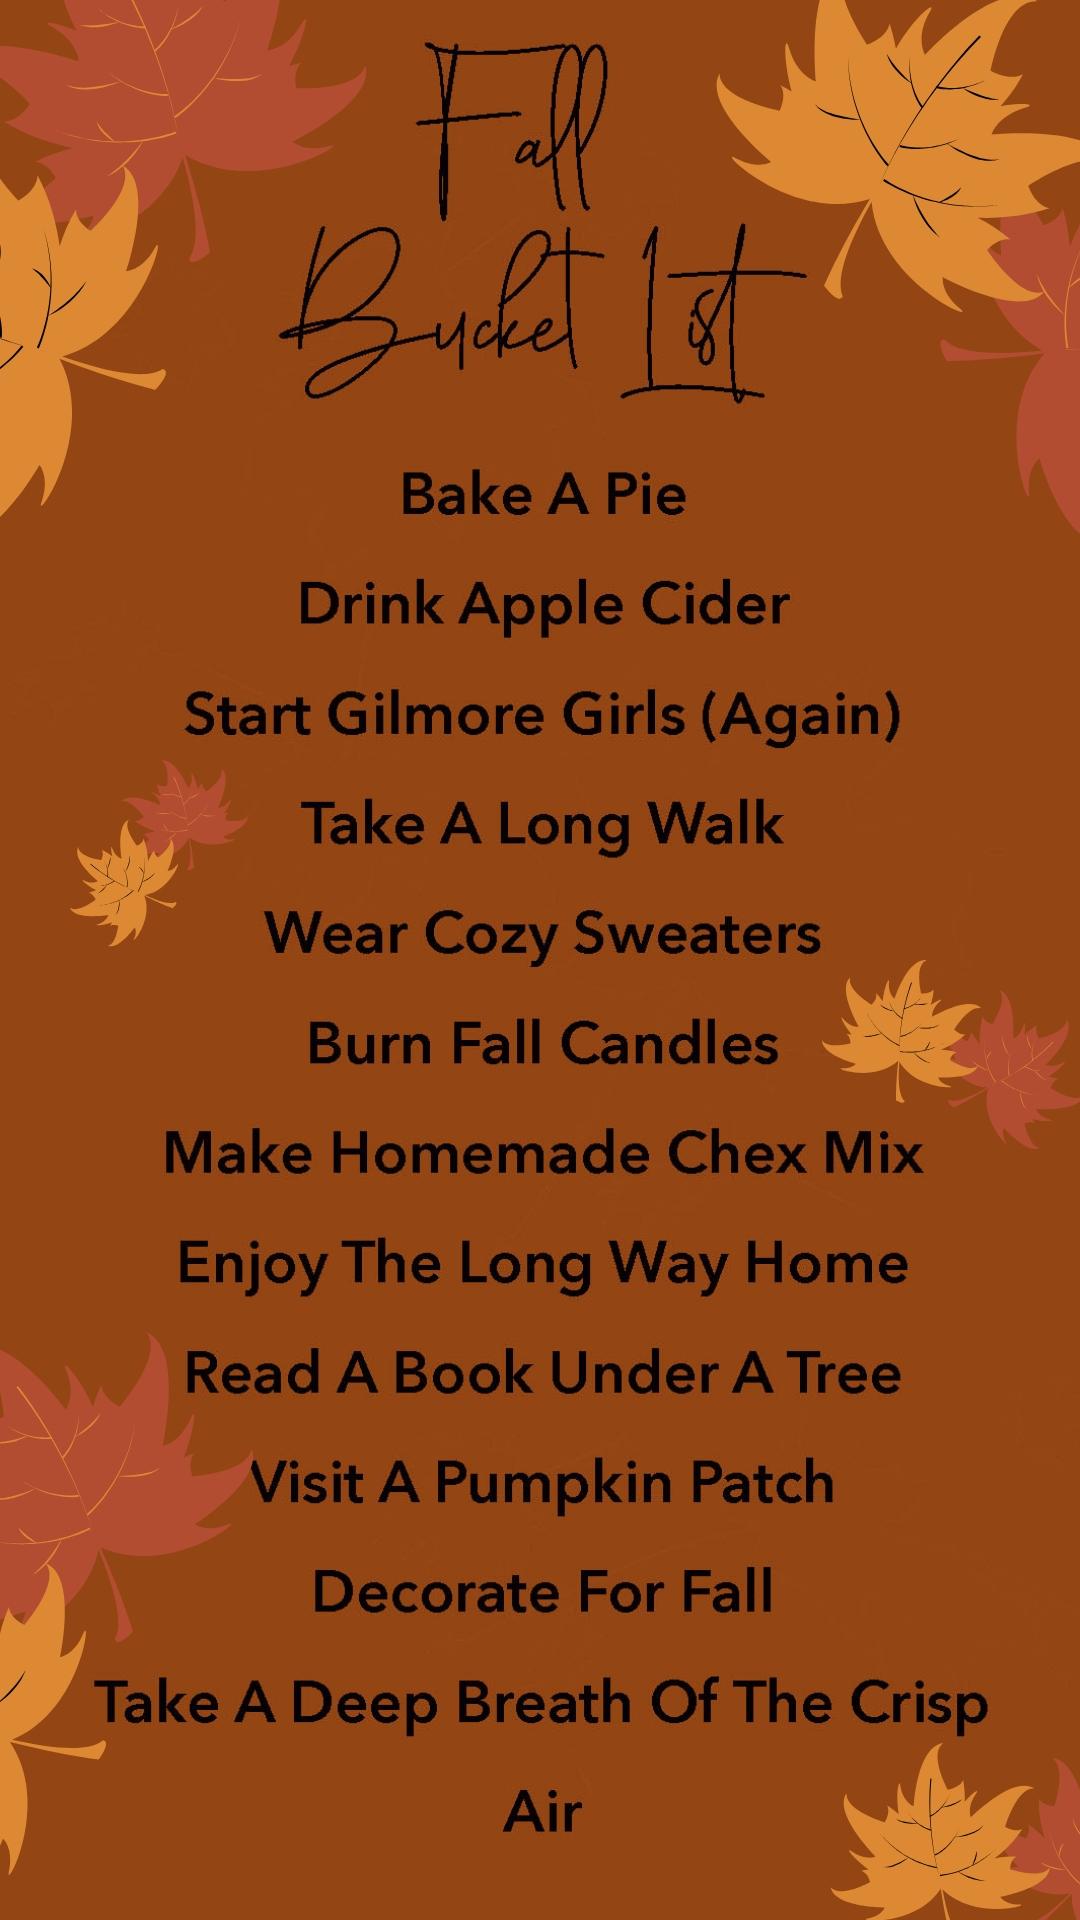 Fall List.jpg